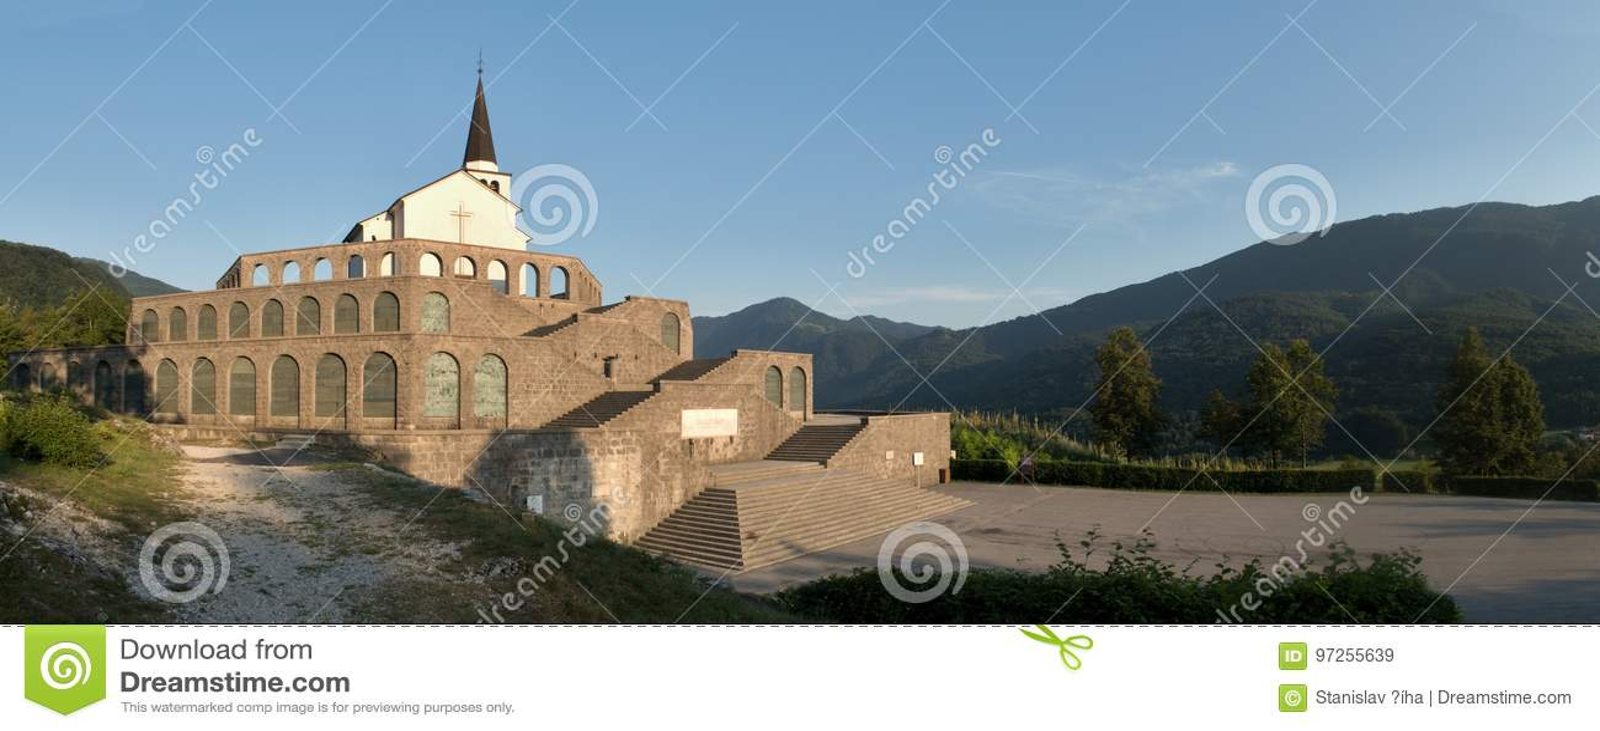 Italian charnel-house form the World War I above Kobarid in Julian Alps in Slovenia